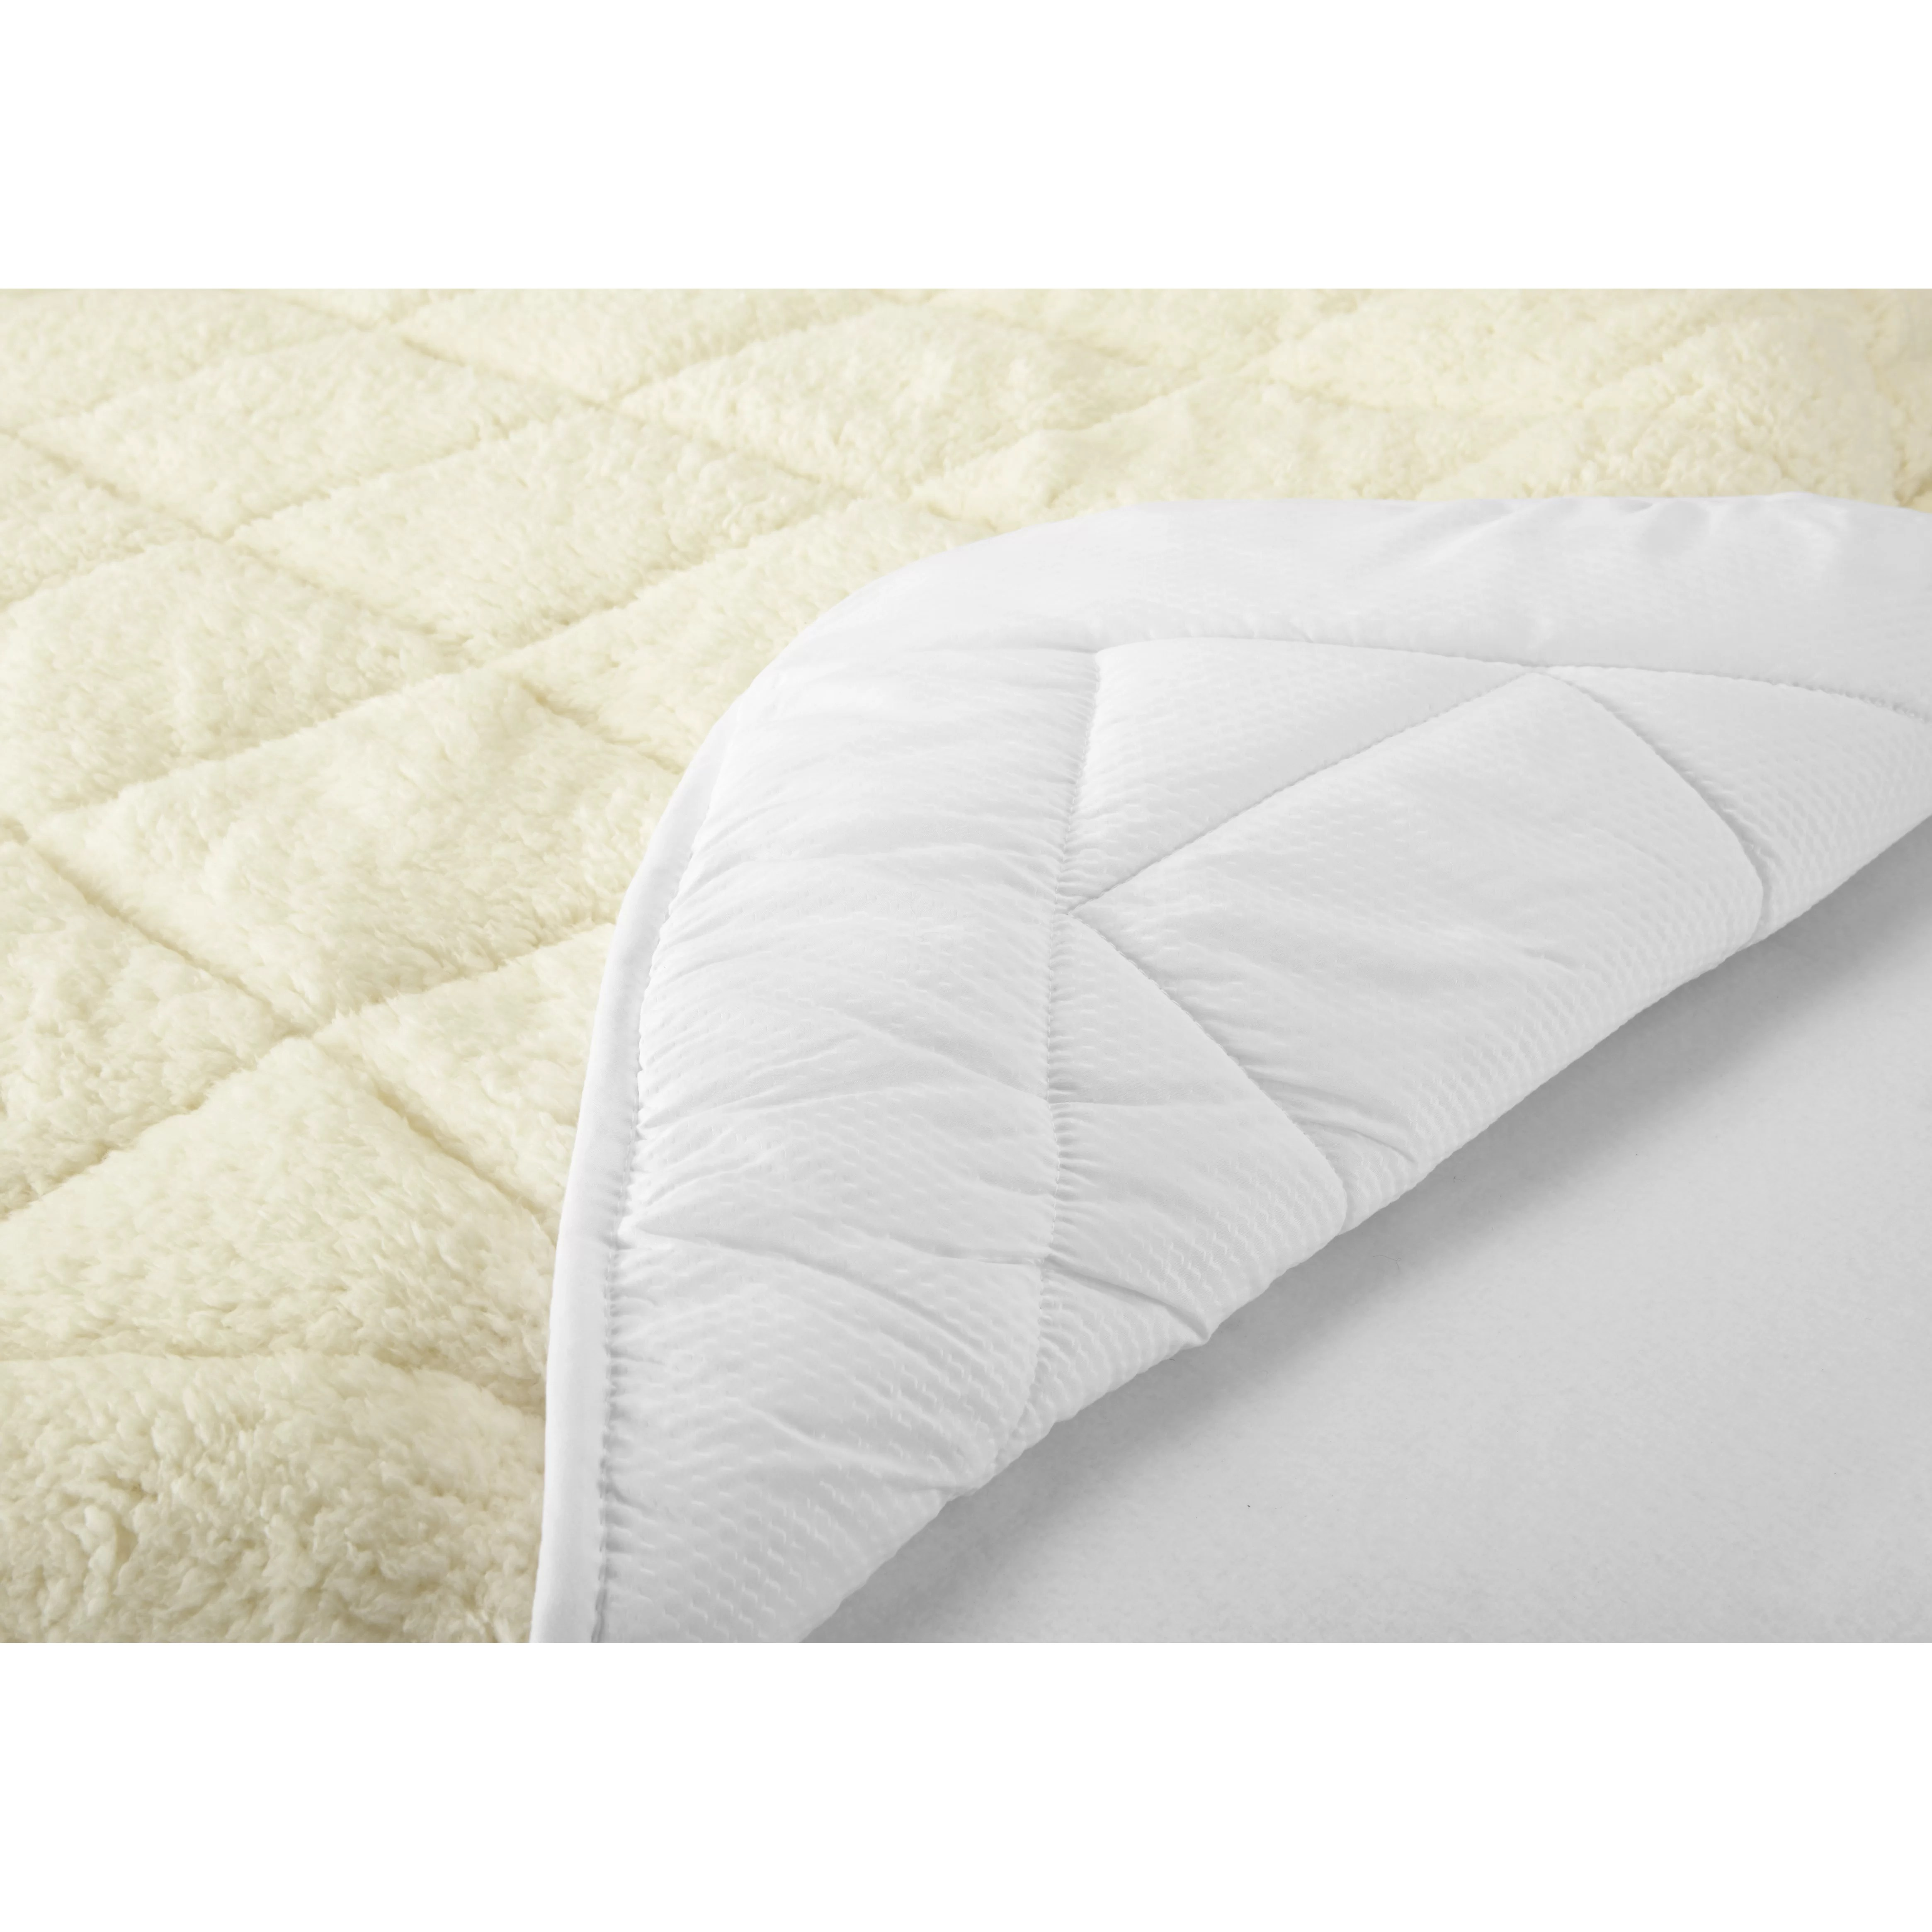 waterproof mattress pad for sofa bed cheap nz sleeper cover home design ideas